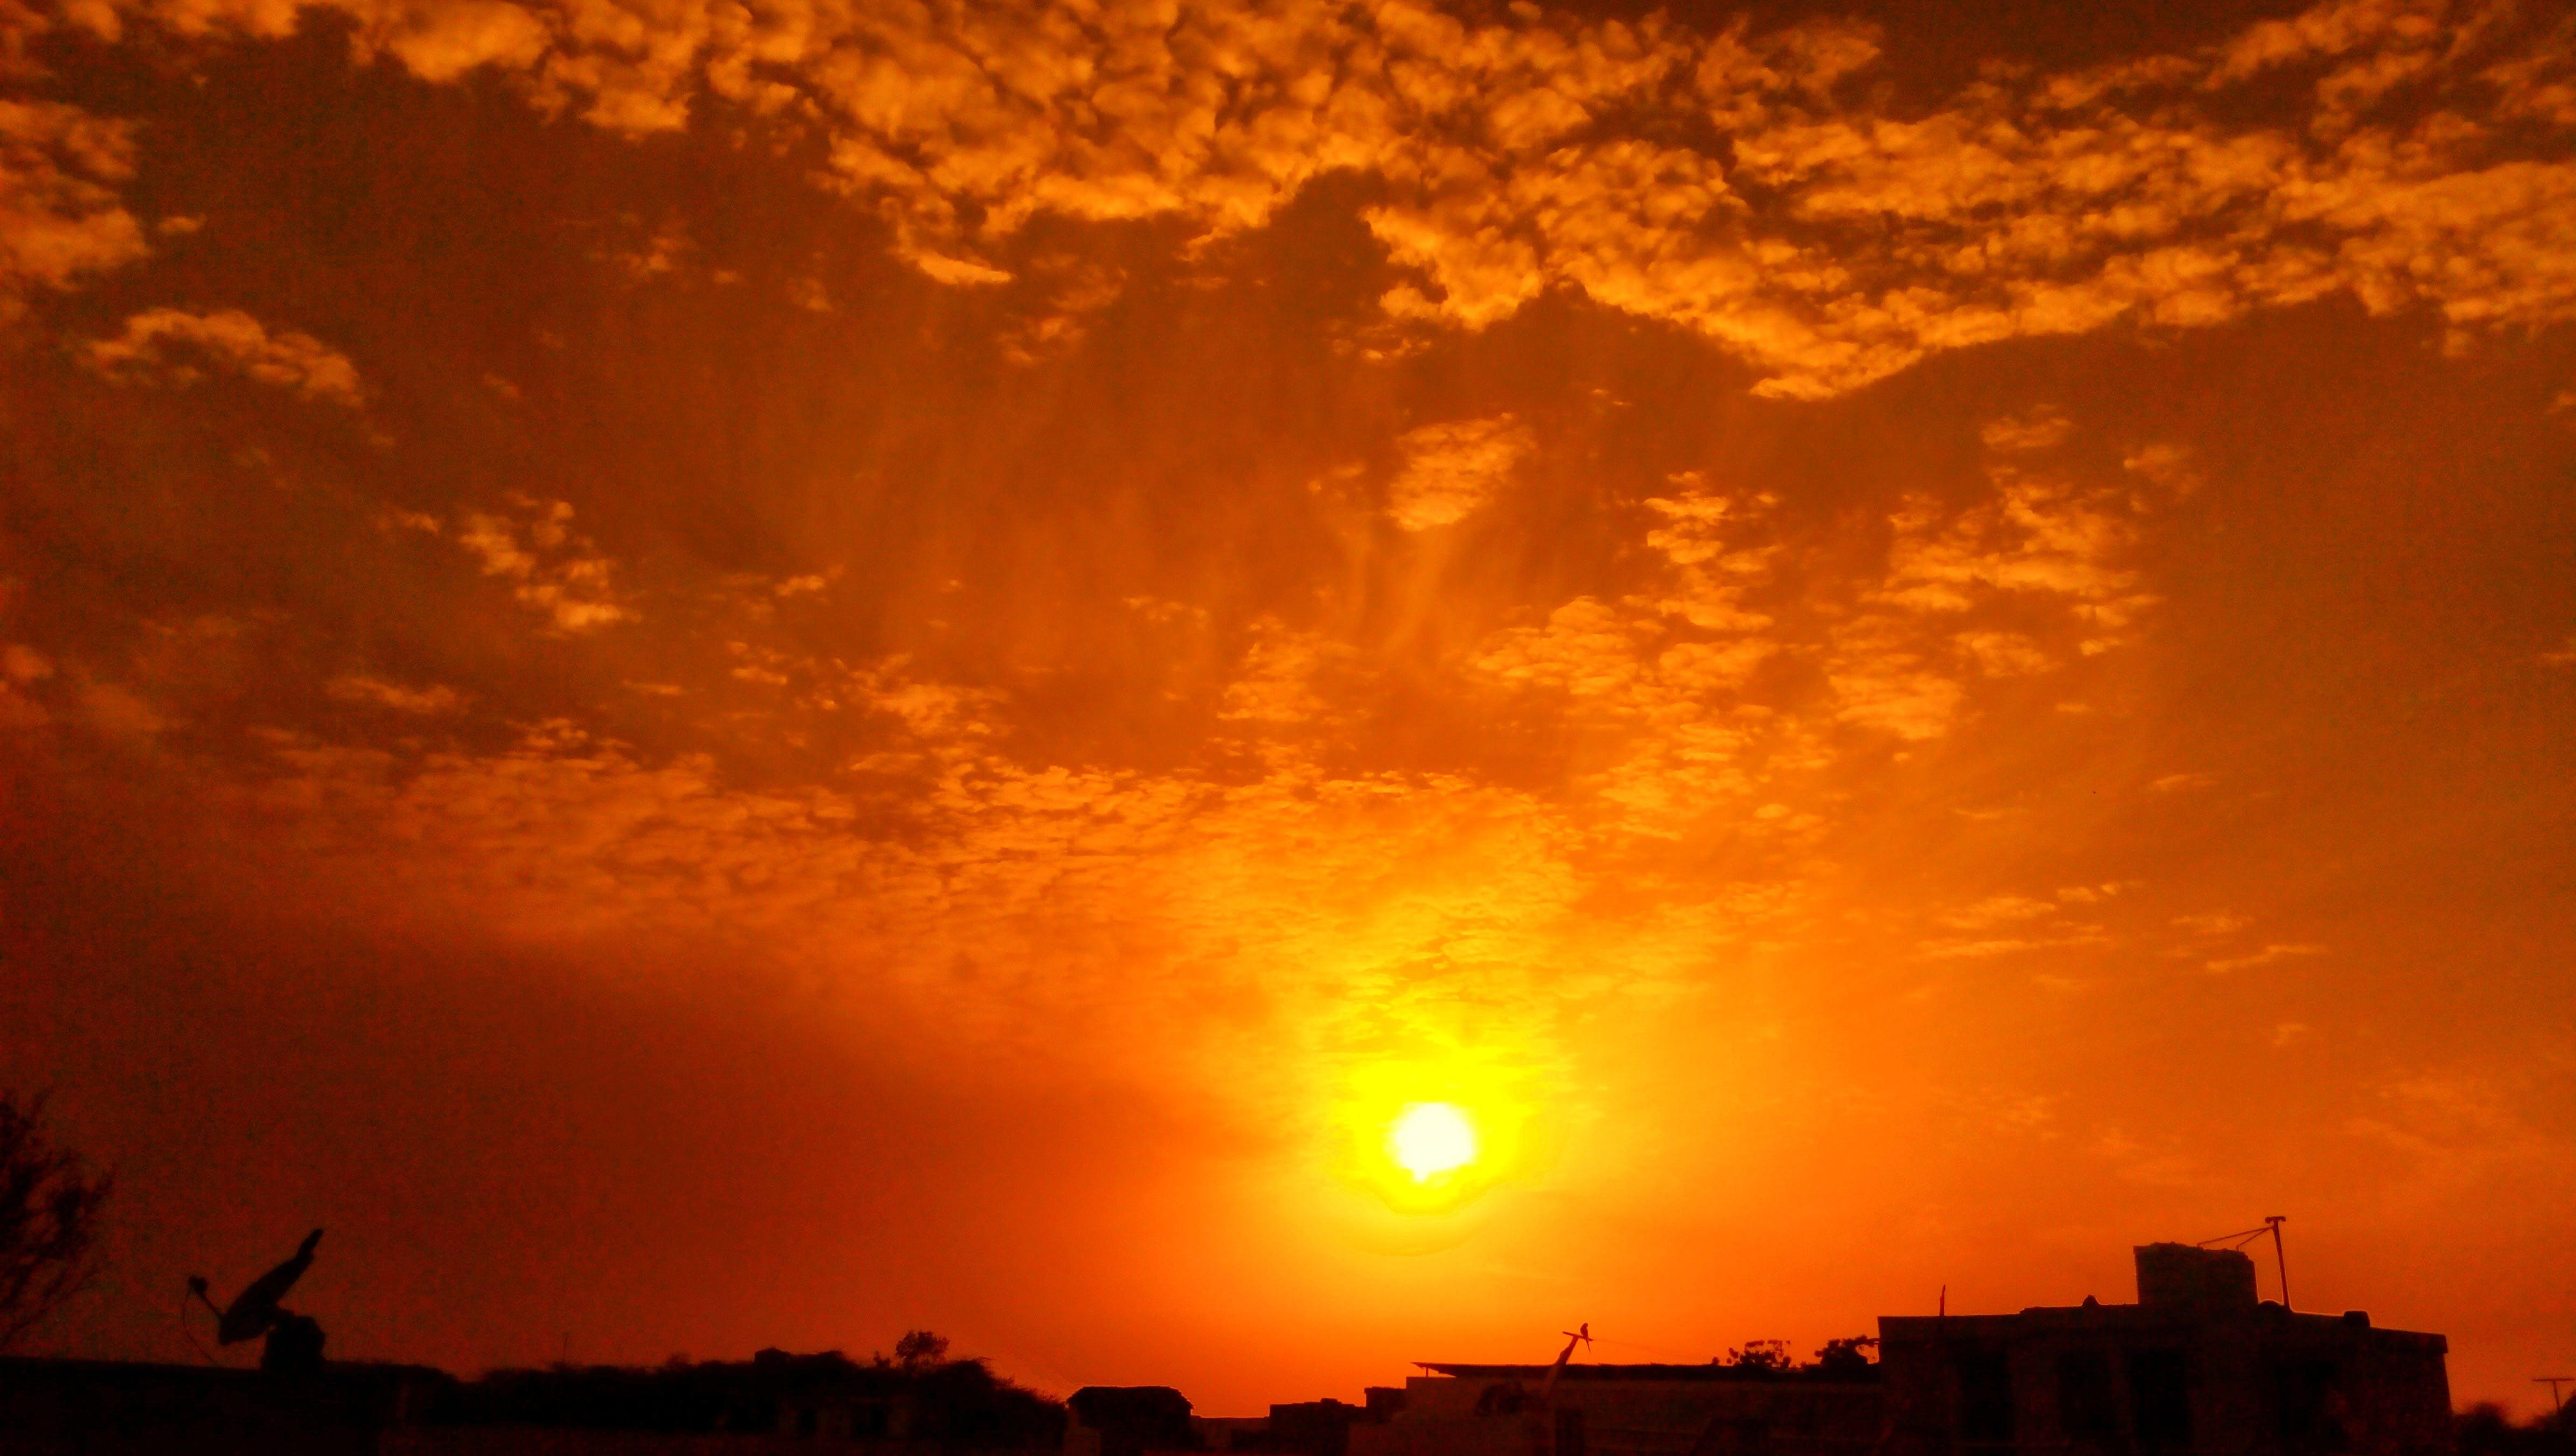 Kostenloses Stock Foto zu #sunset_pics #sunsetsniper #sunset_stream #sunset_